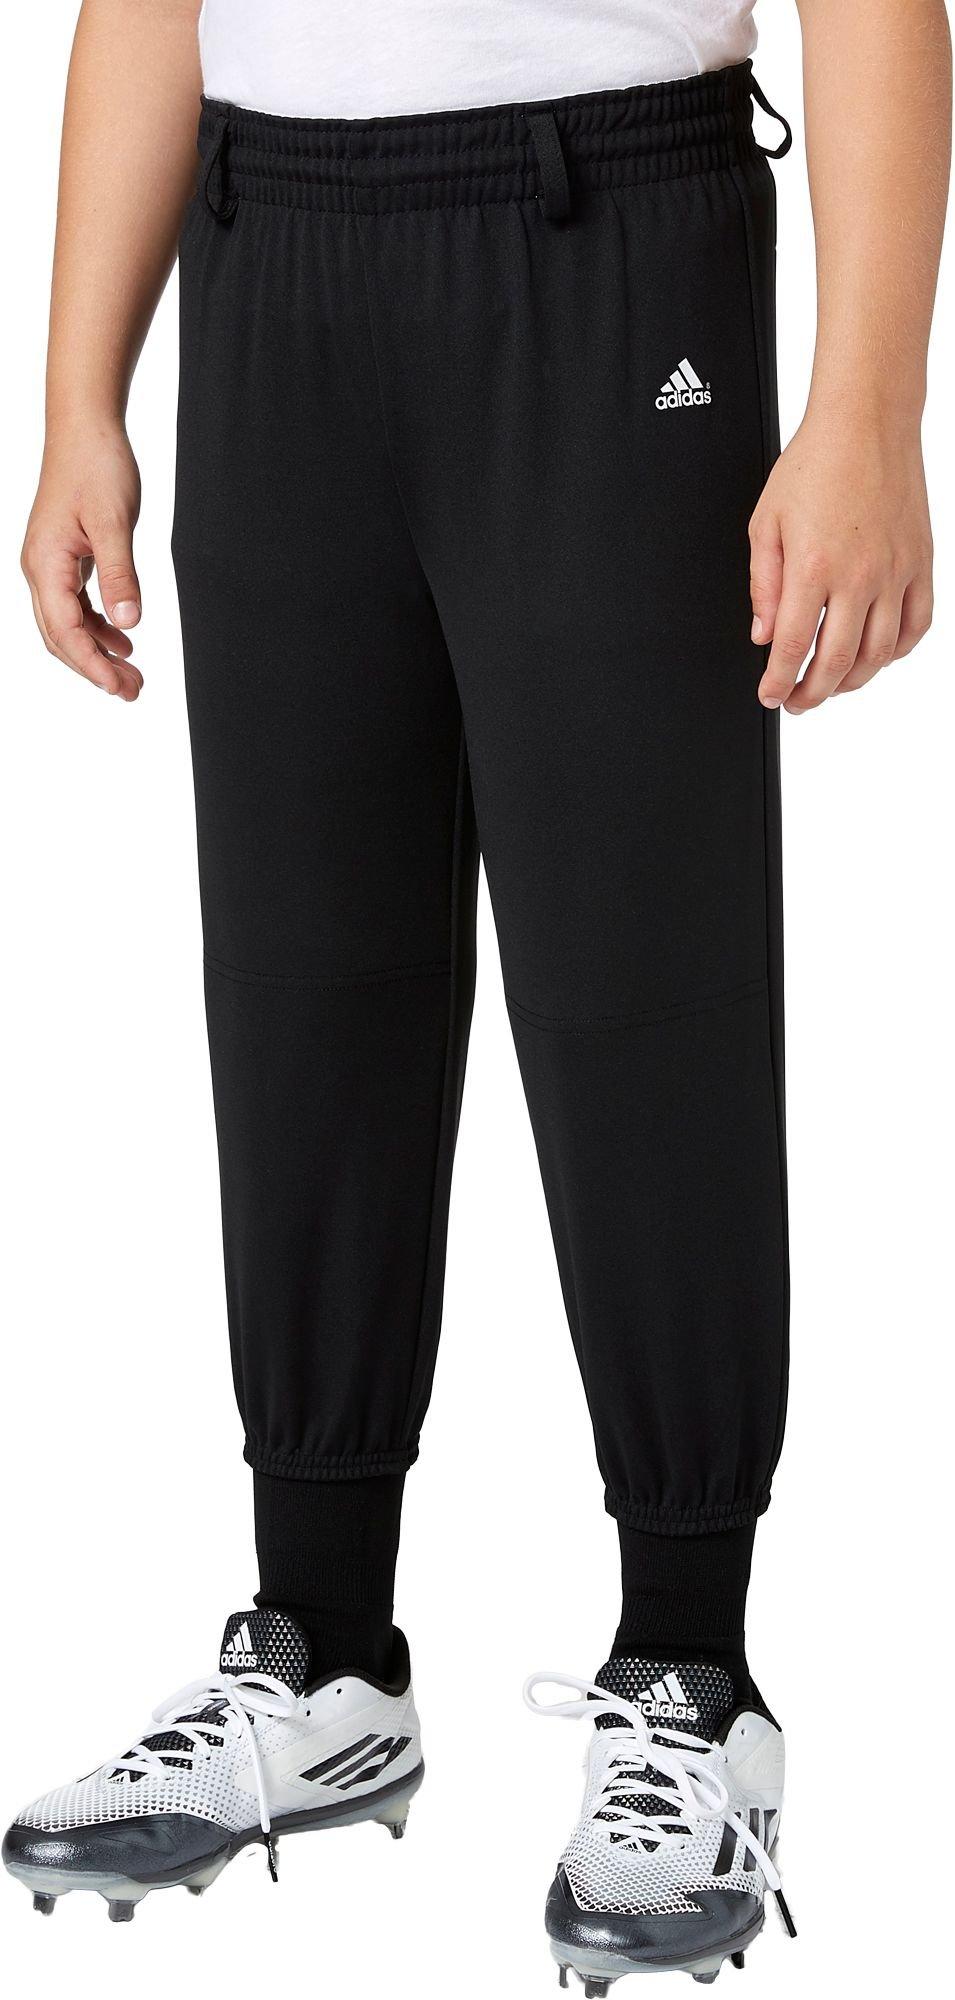 Adidas Boys' Triple Stripe Pull Up Baseball Pants (Black, XS) by adidas